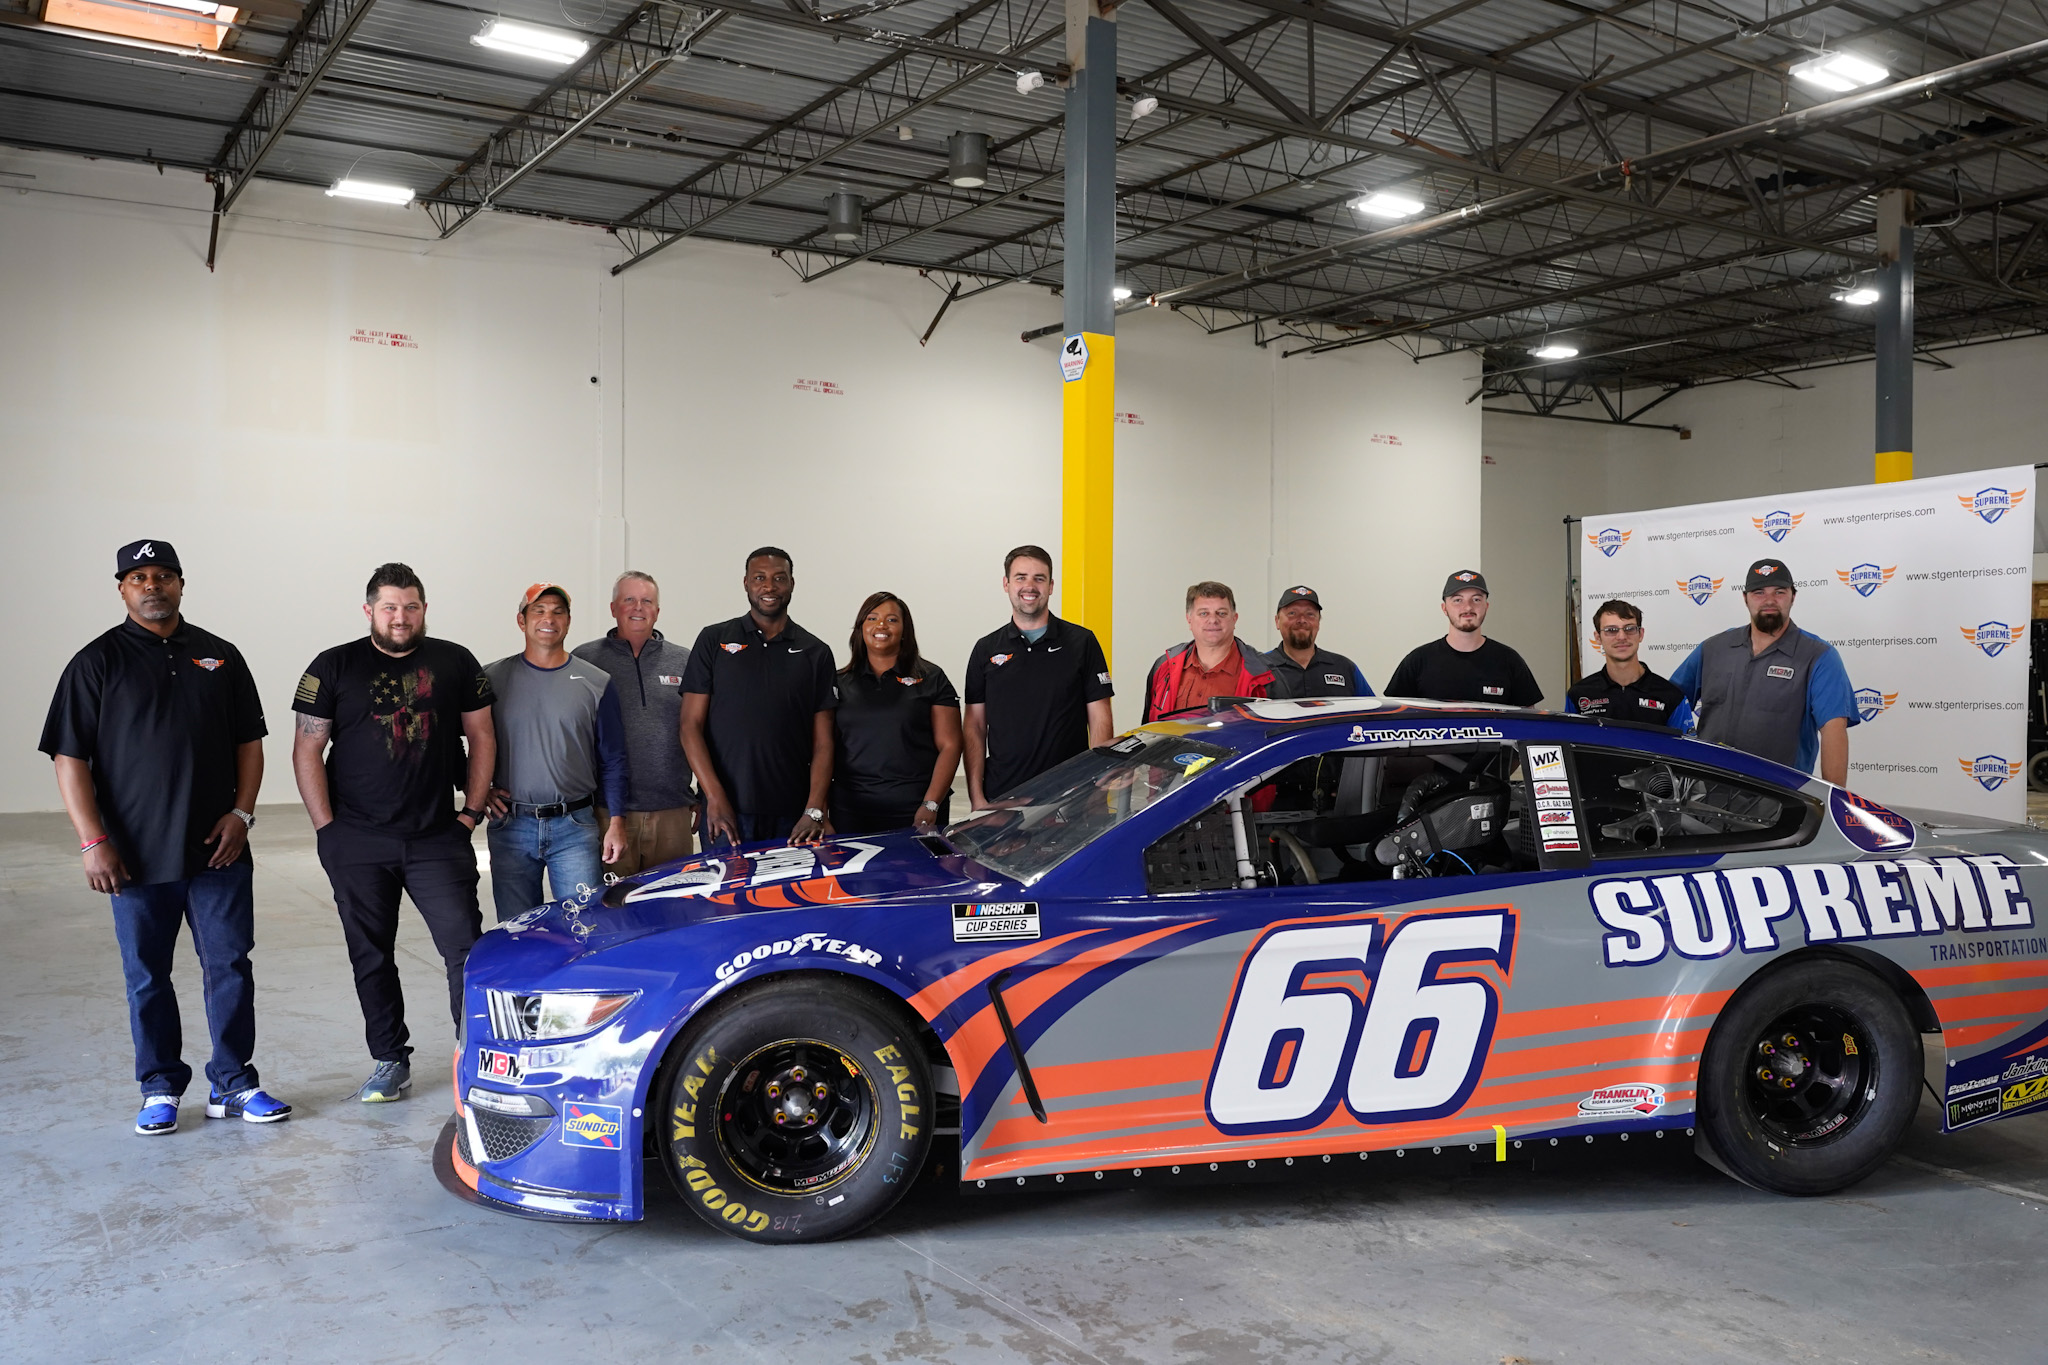 Supreme Transportation Group Team Photo with -branded nascar -